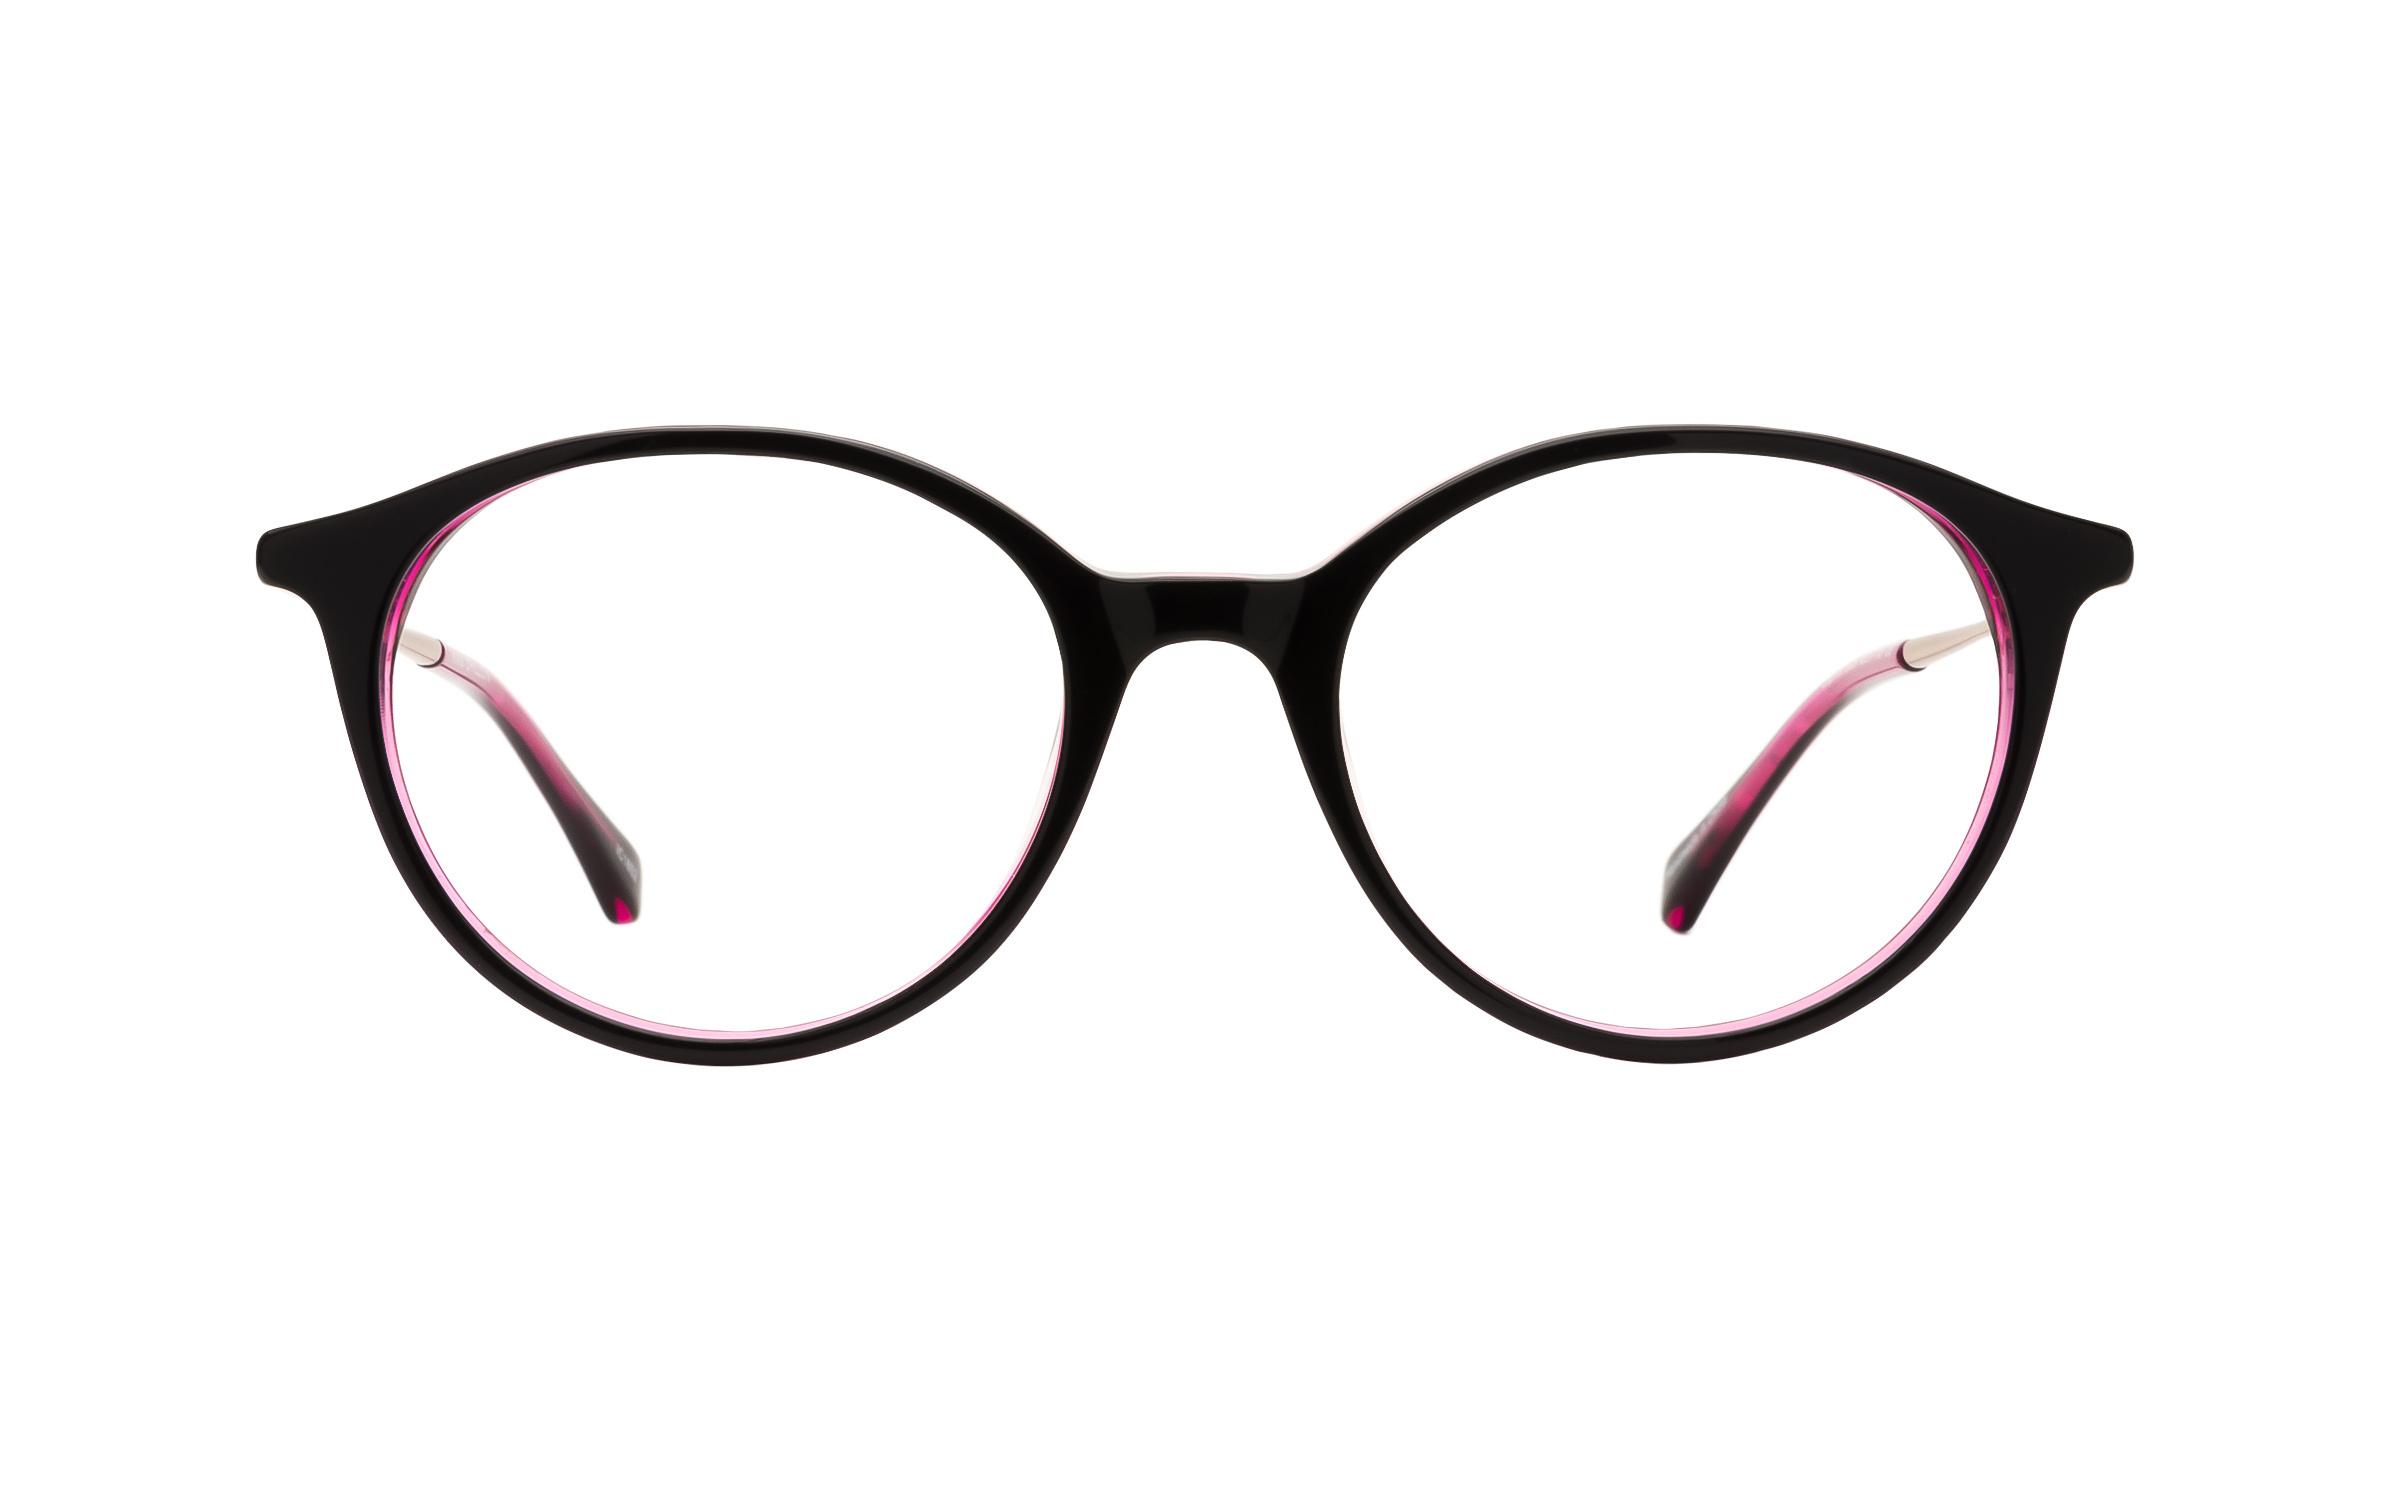 Kam_Dhillon_Womens_Glasses_Round_BlackPurplePink_PlasticMetal_Online_Coastal